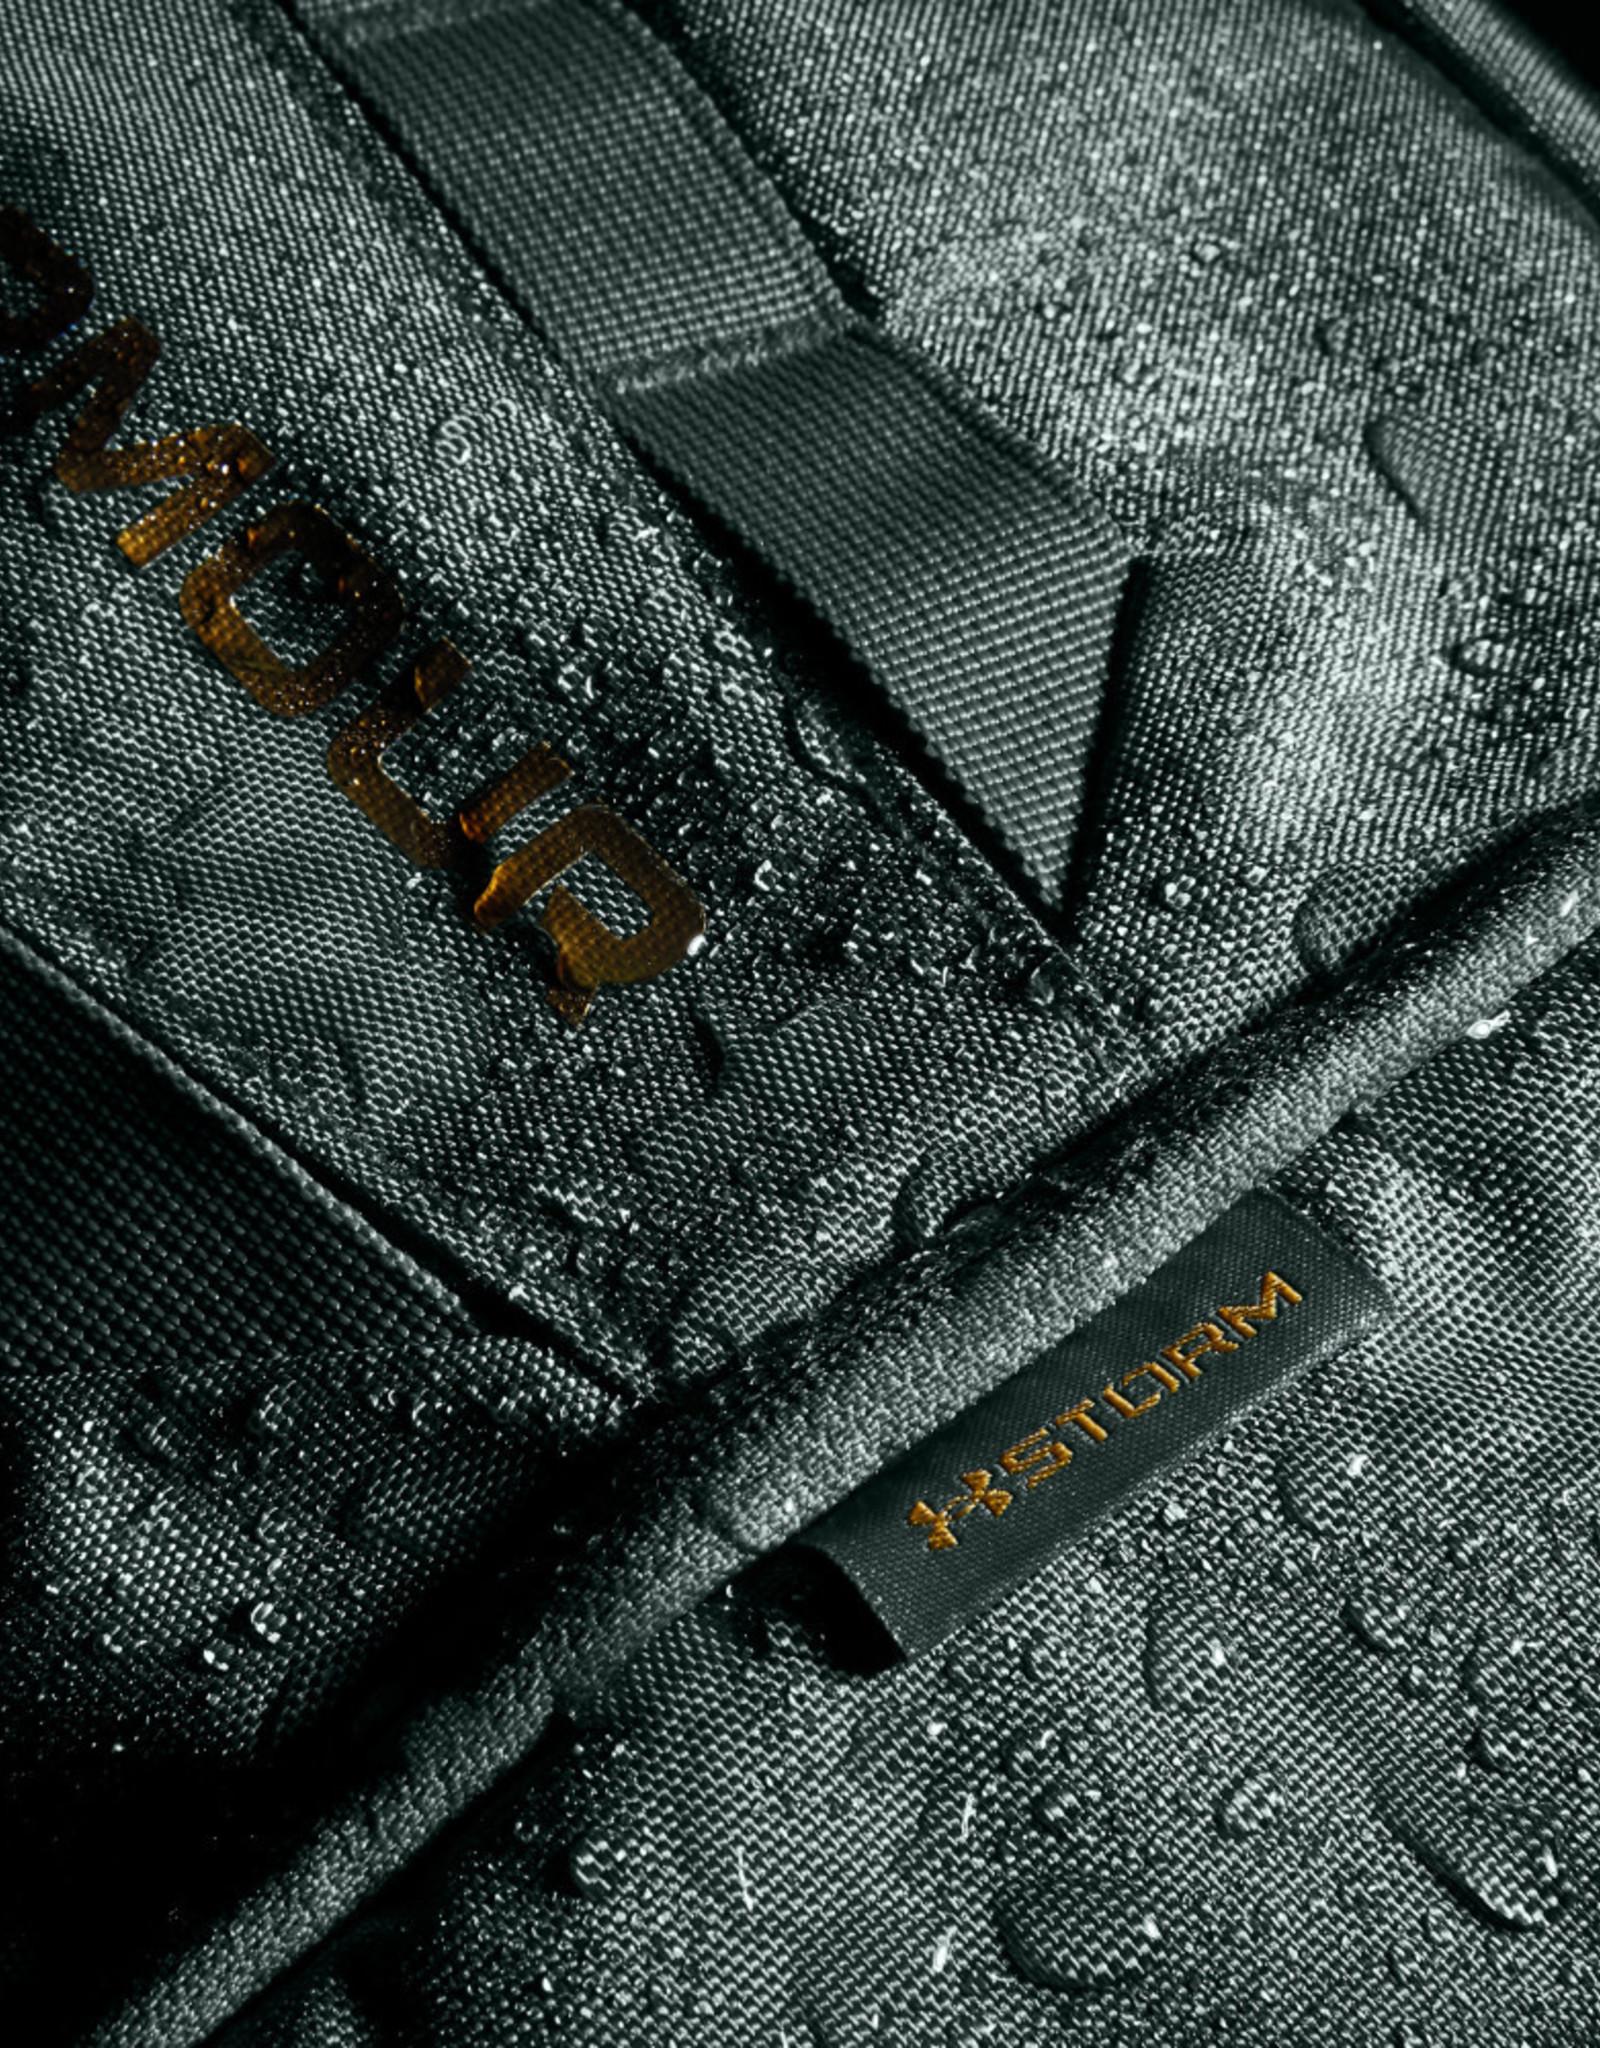 Under Armour UA Hustle 5.0 Backpack - Lichen Blue-Lichen Blue-Metallic Gold Luster - OSFA